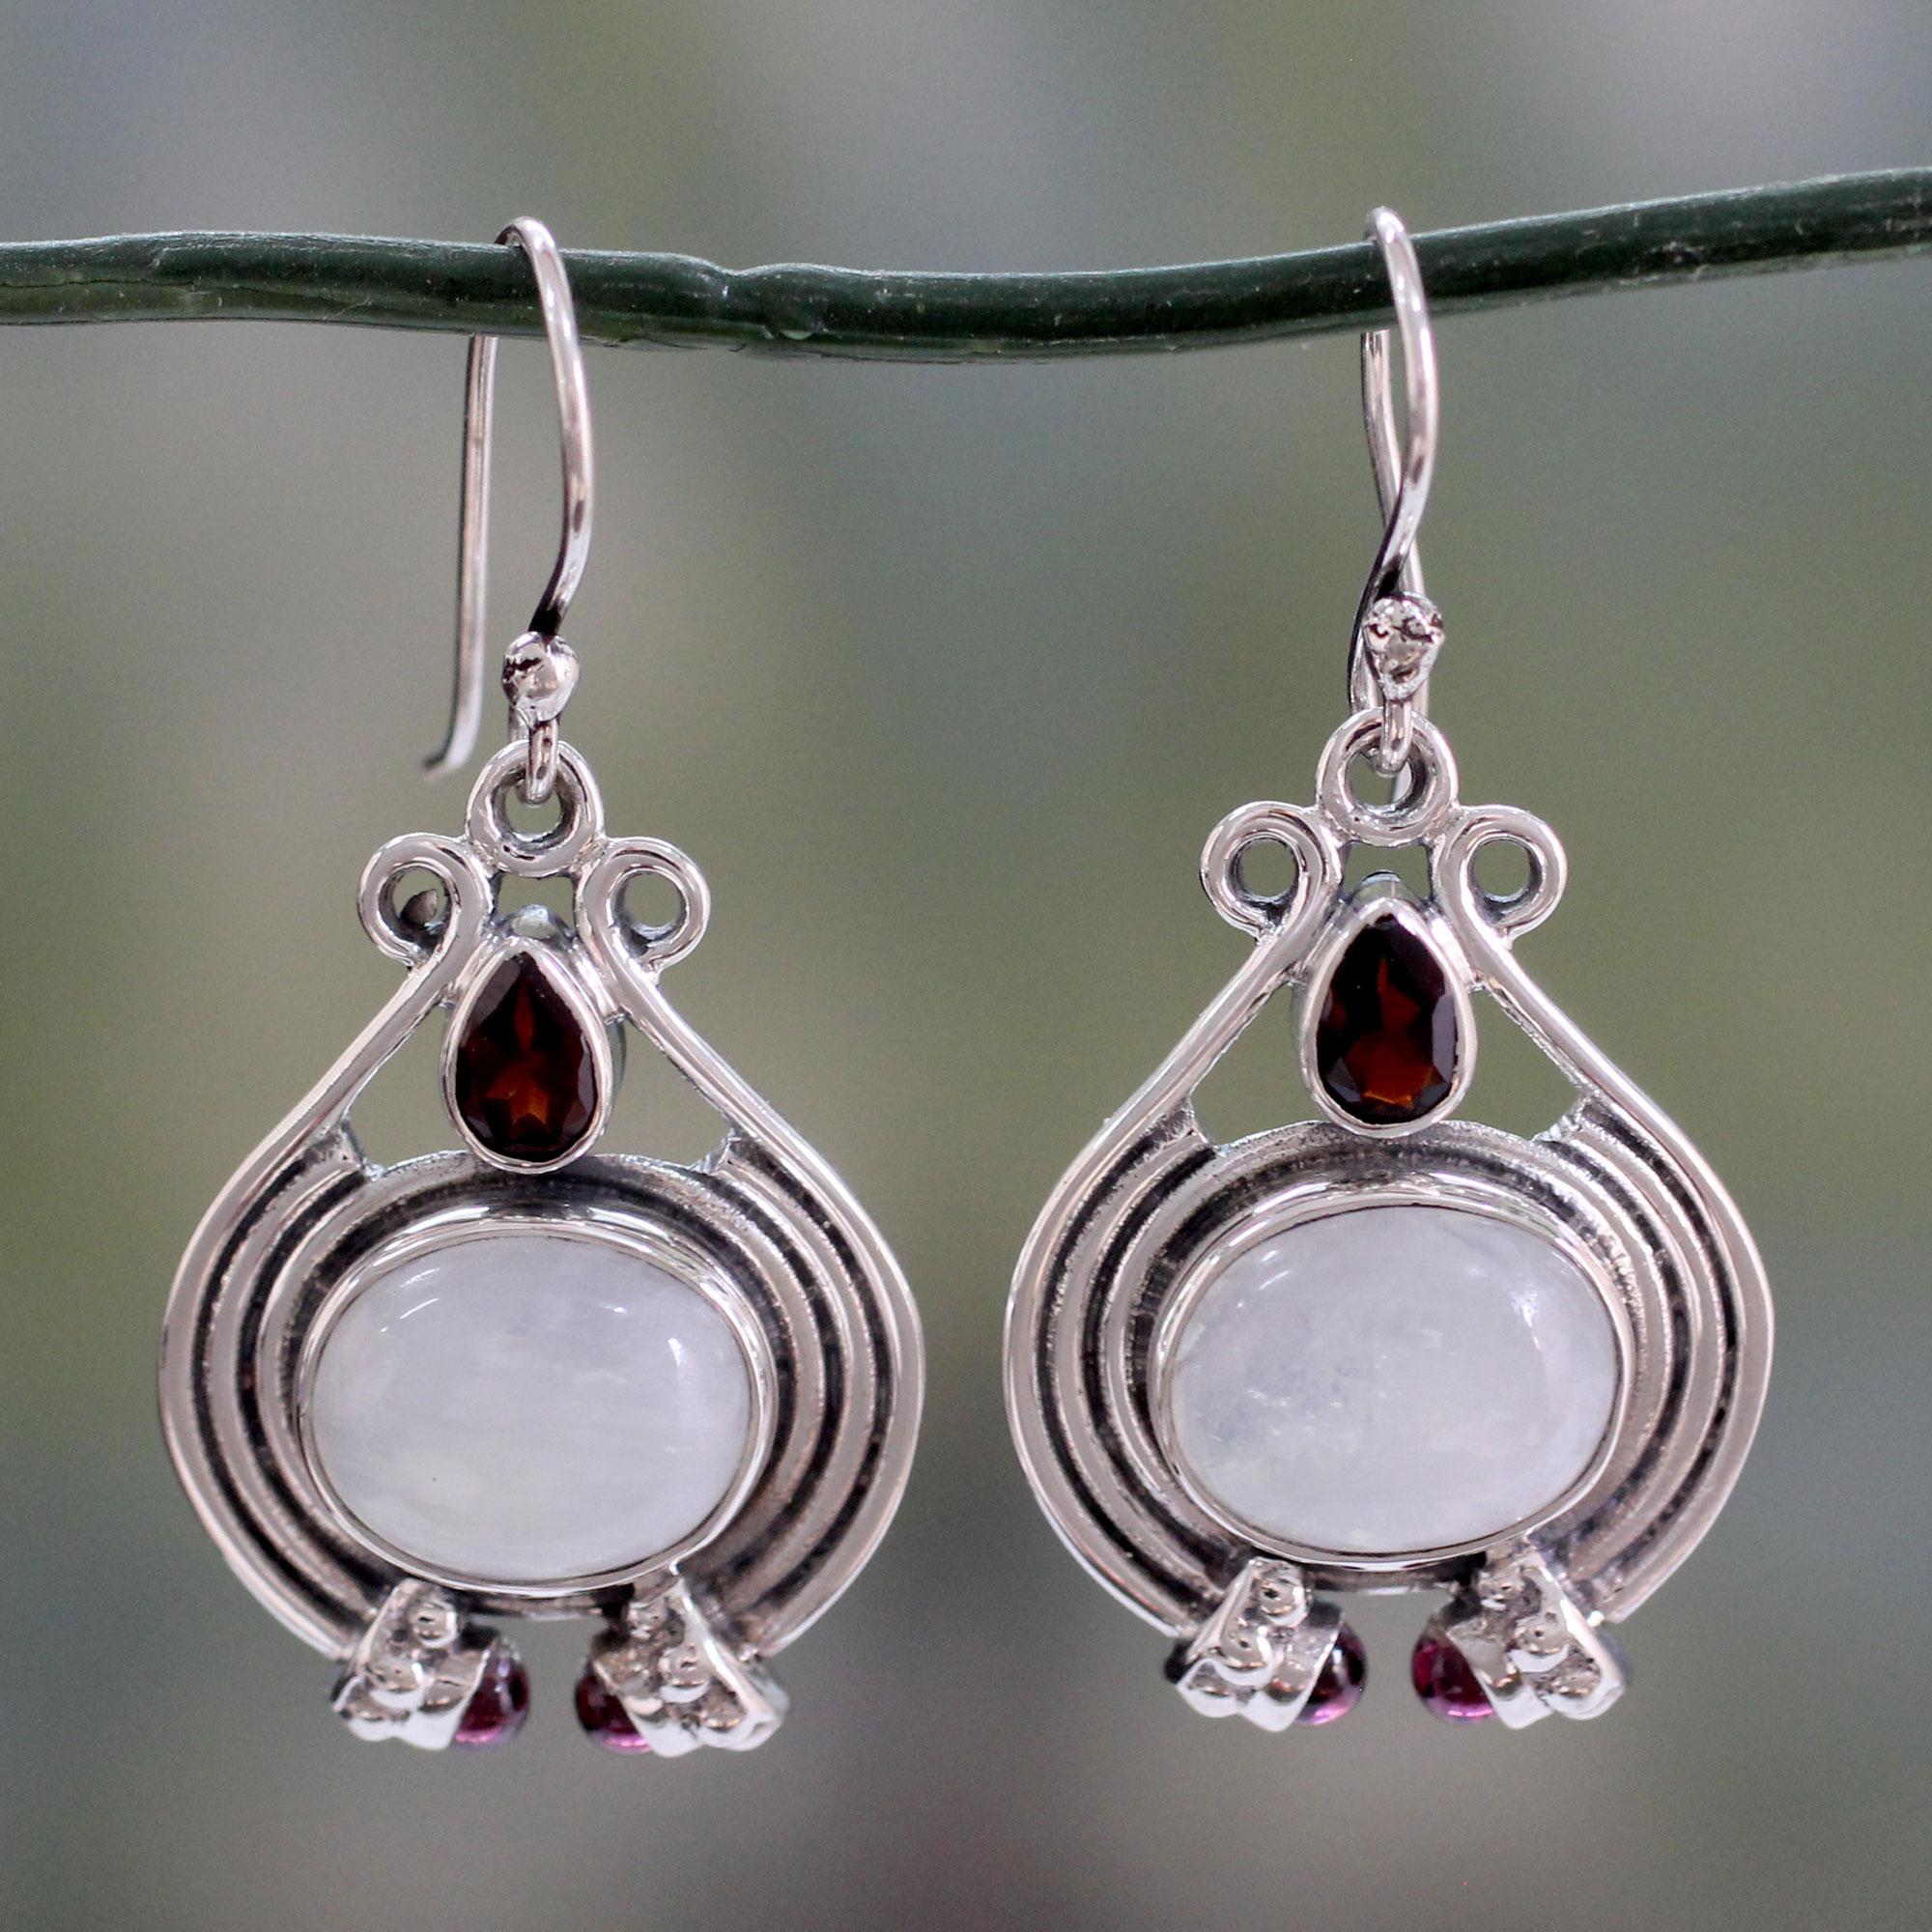 Natural Rainbow Moonstone Earring,Garnet Earring,Drop Earring,Handmade Earring,Gemstone jewelry,92.5 Sterling Silver Earring,Wedding Gift